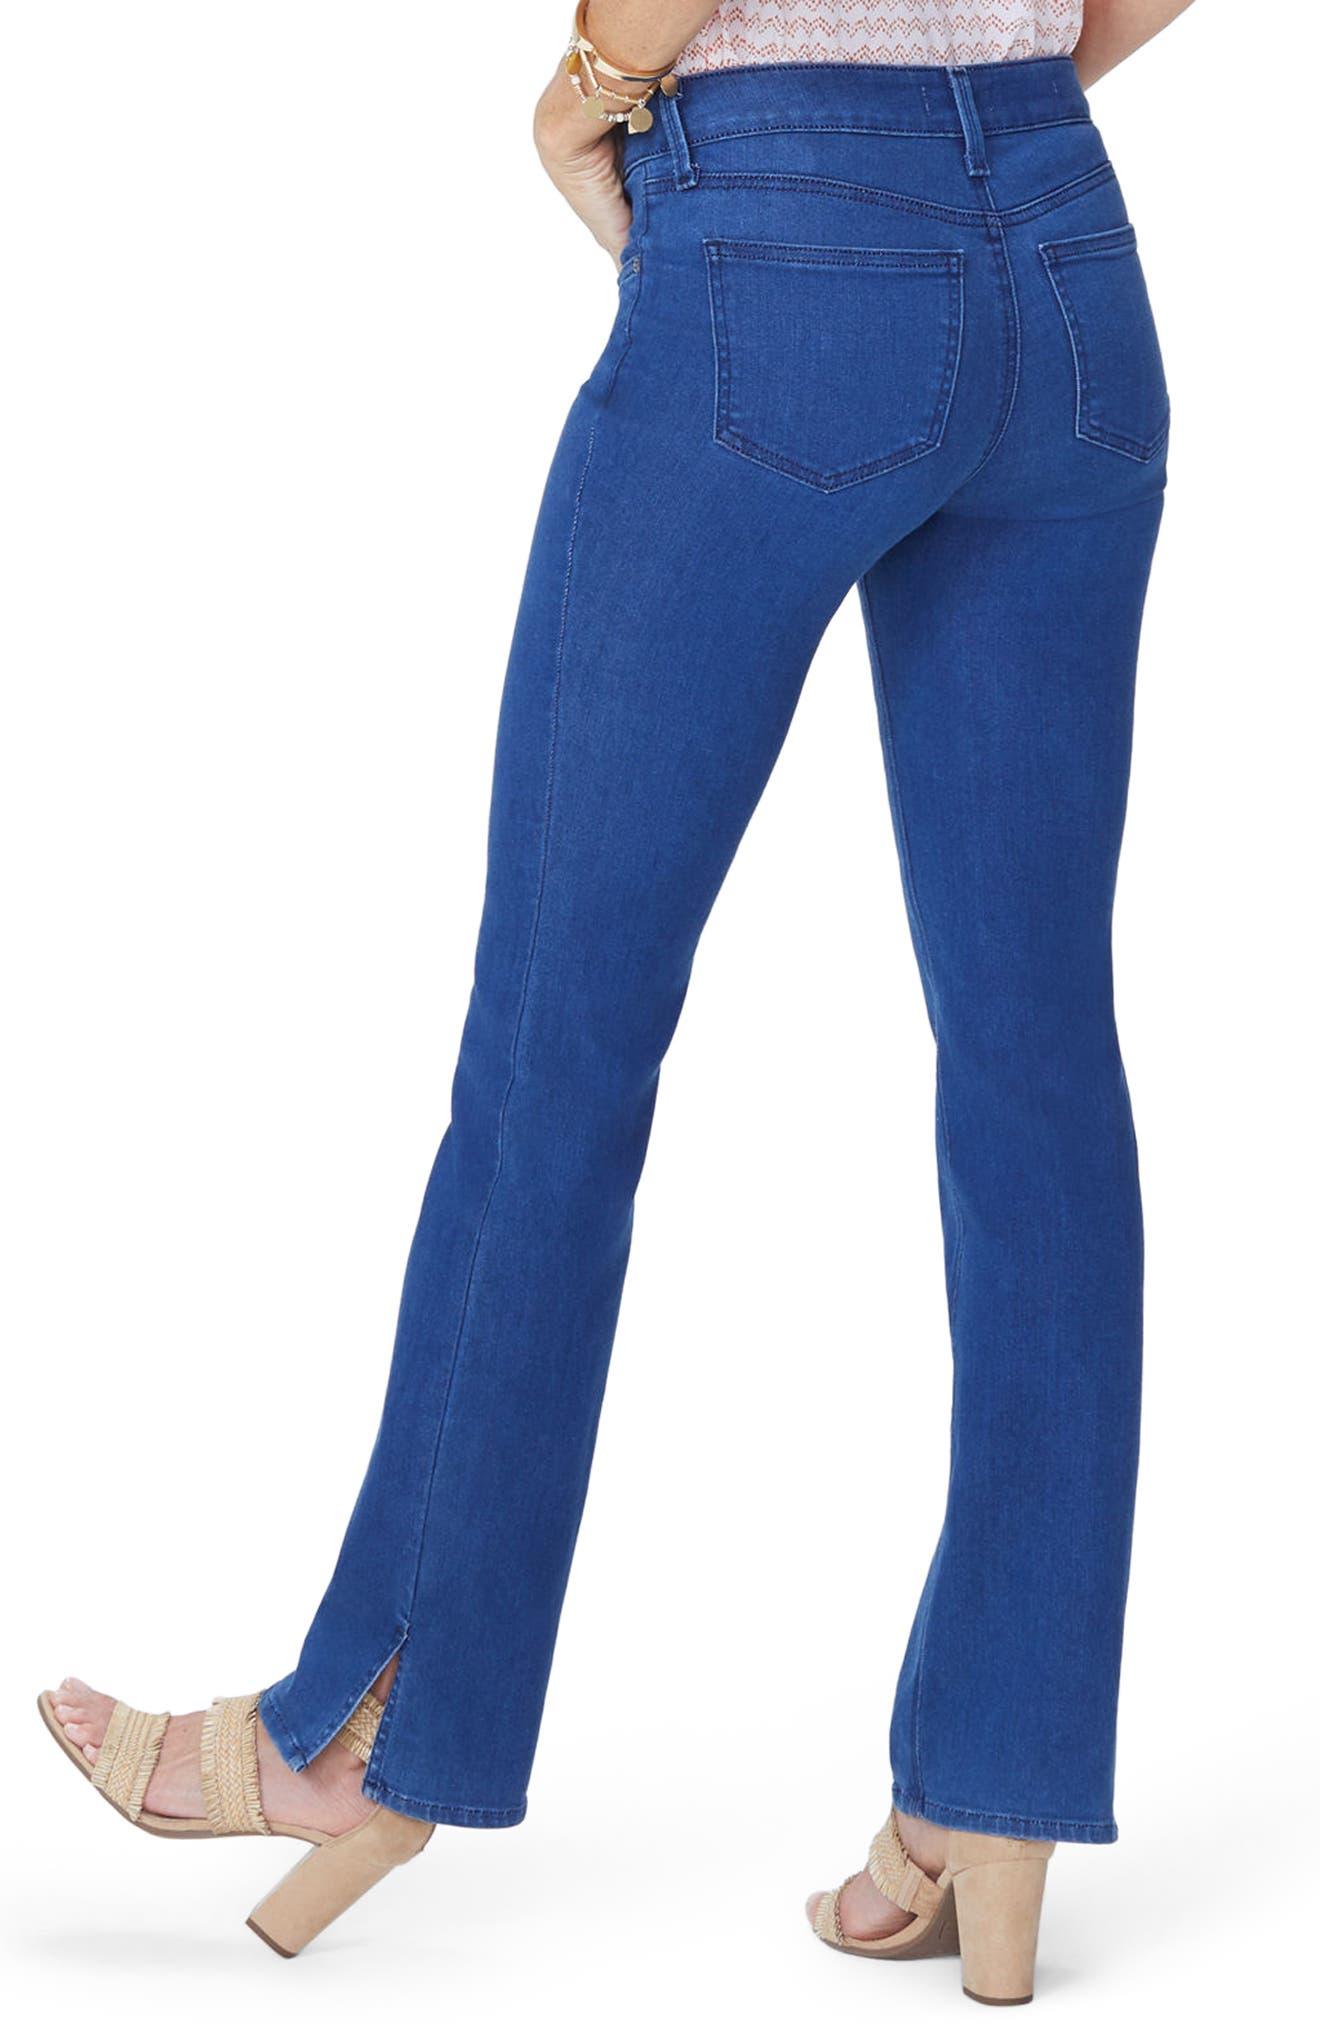 Billie Side Slit Mini Bootcut Jeans,                             Alternate thumbnail 2, color,                             427